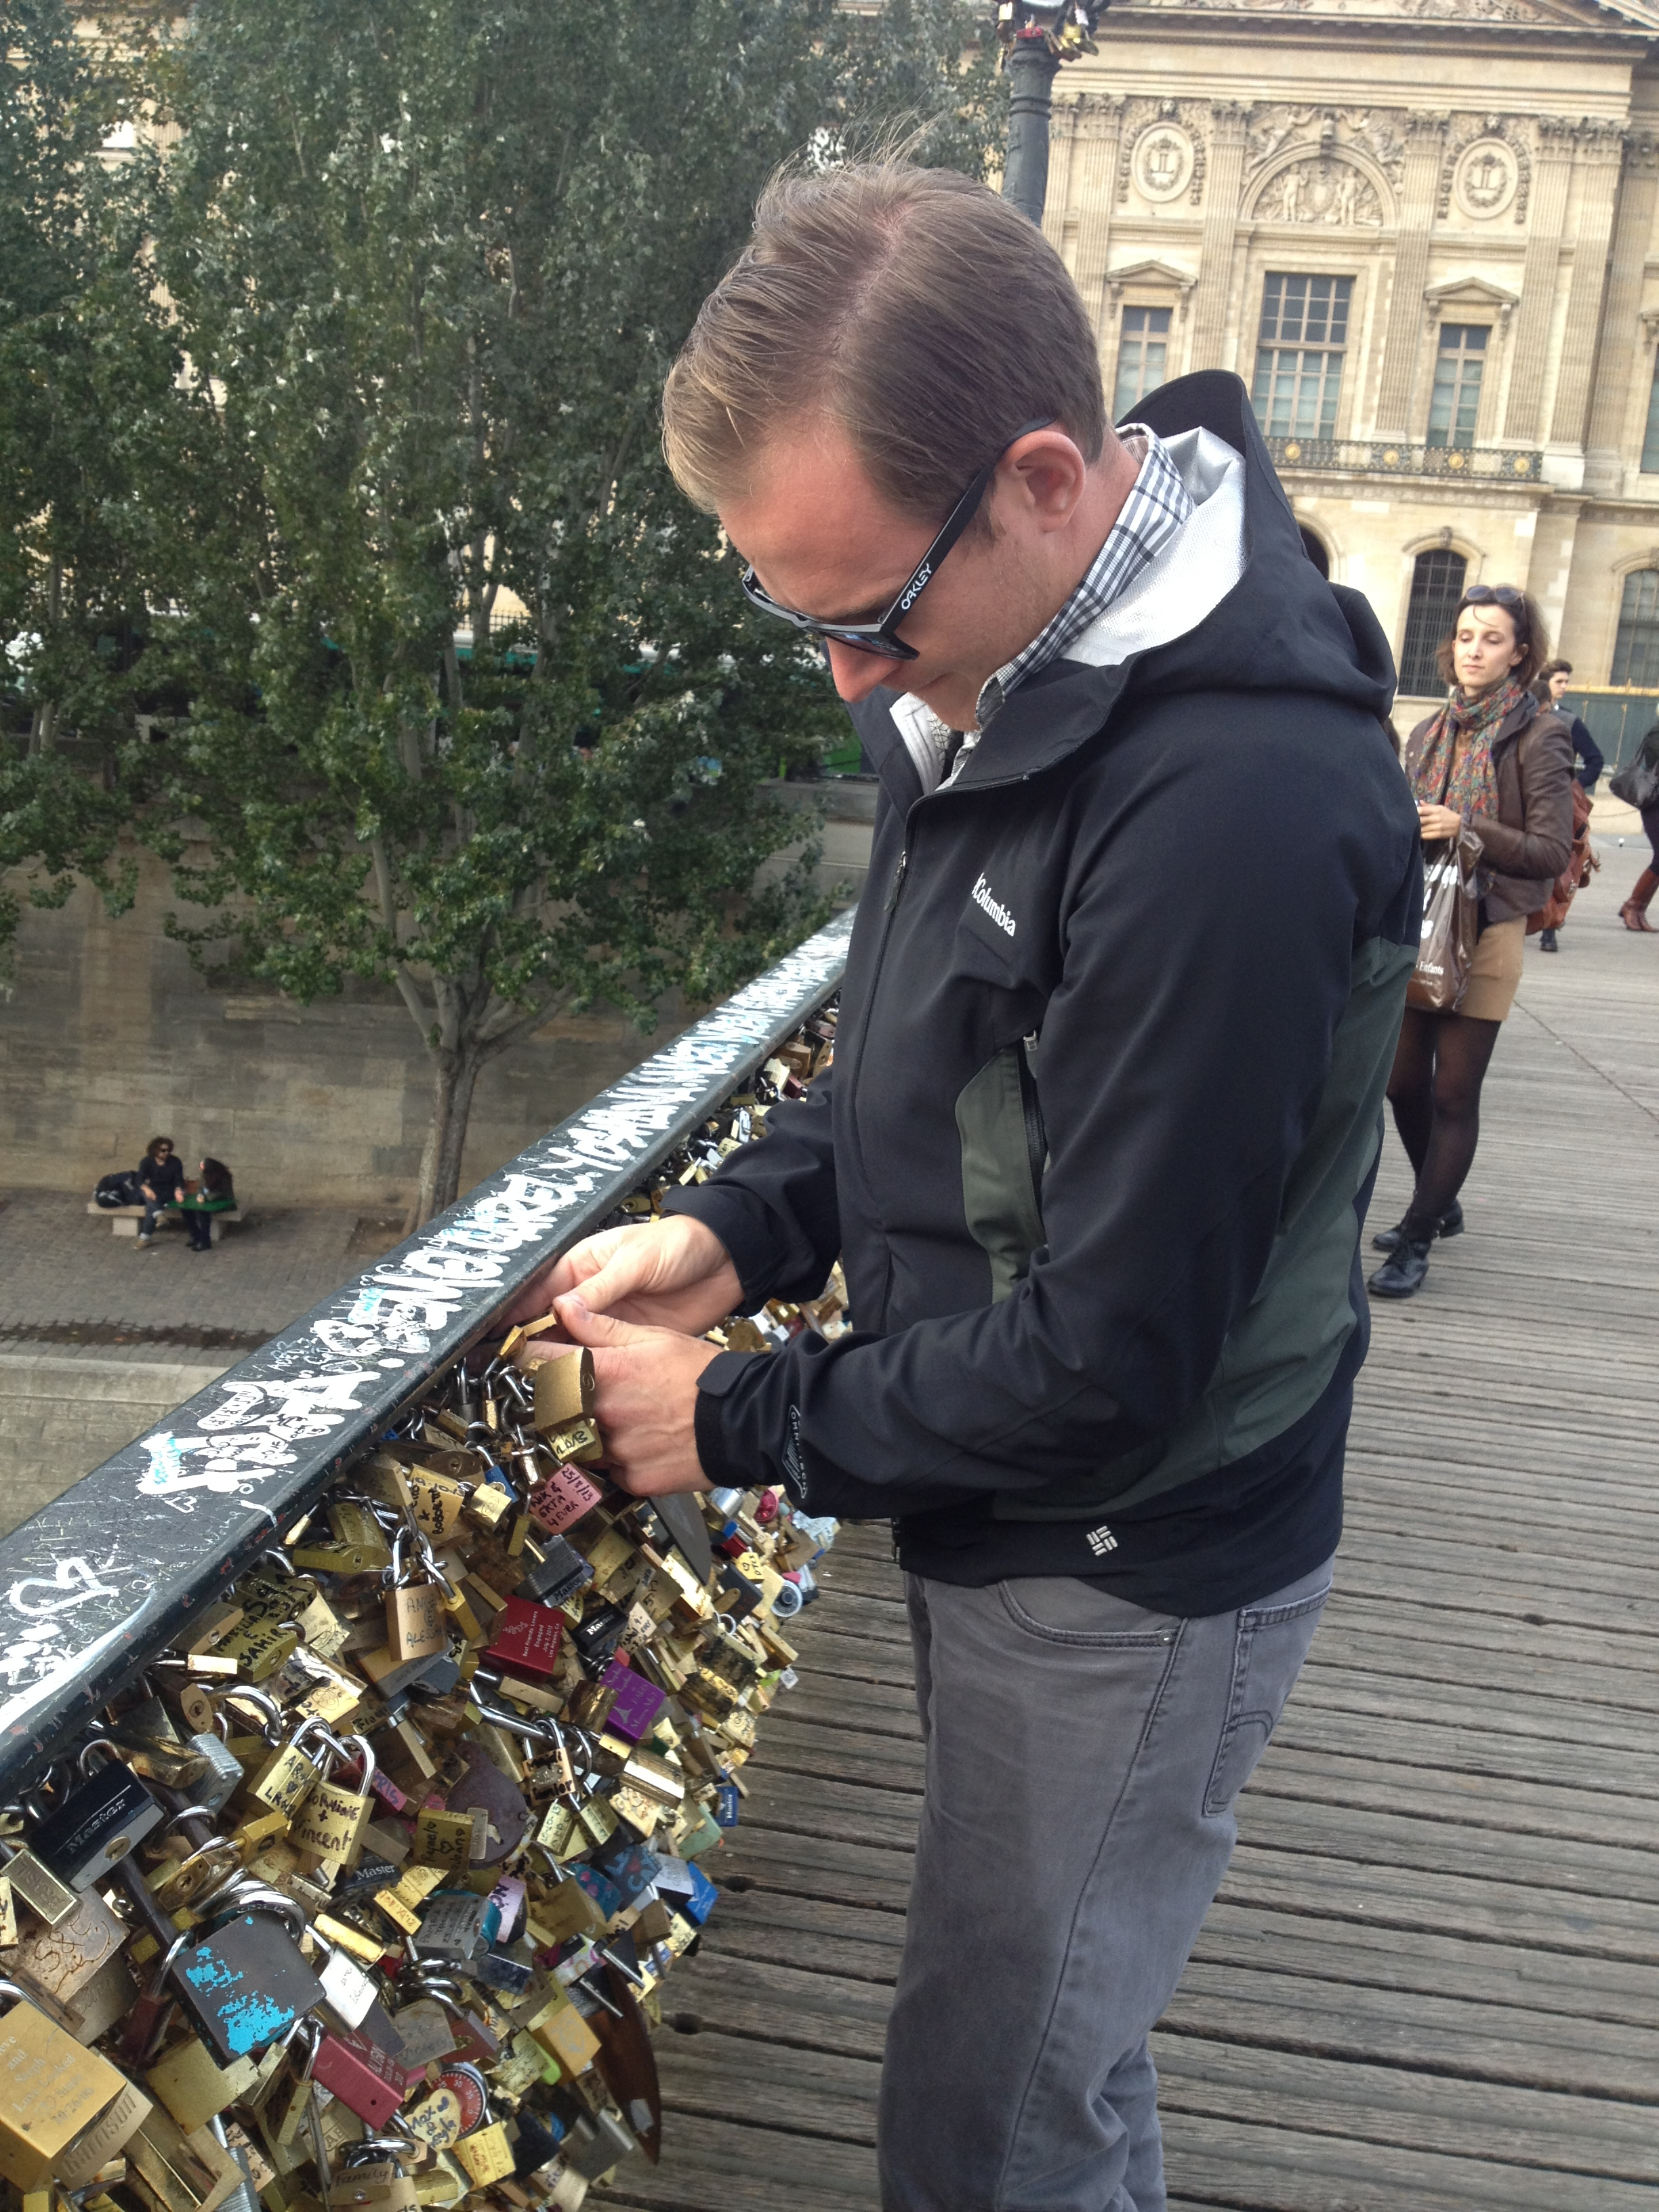 ryan attaching our love lock to the bridge